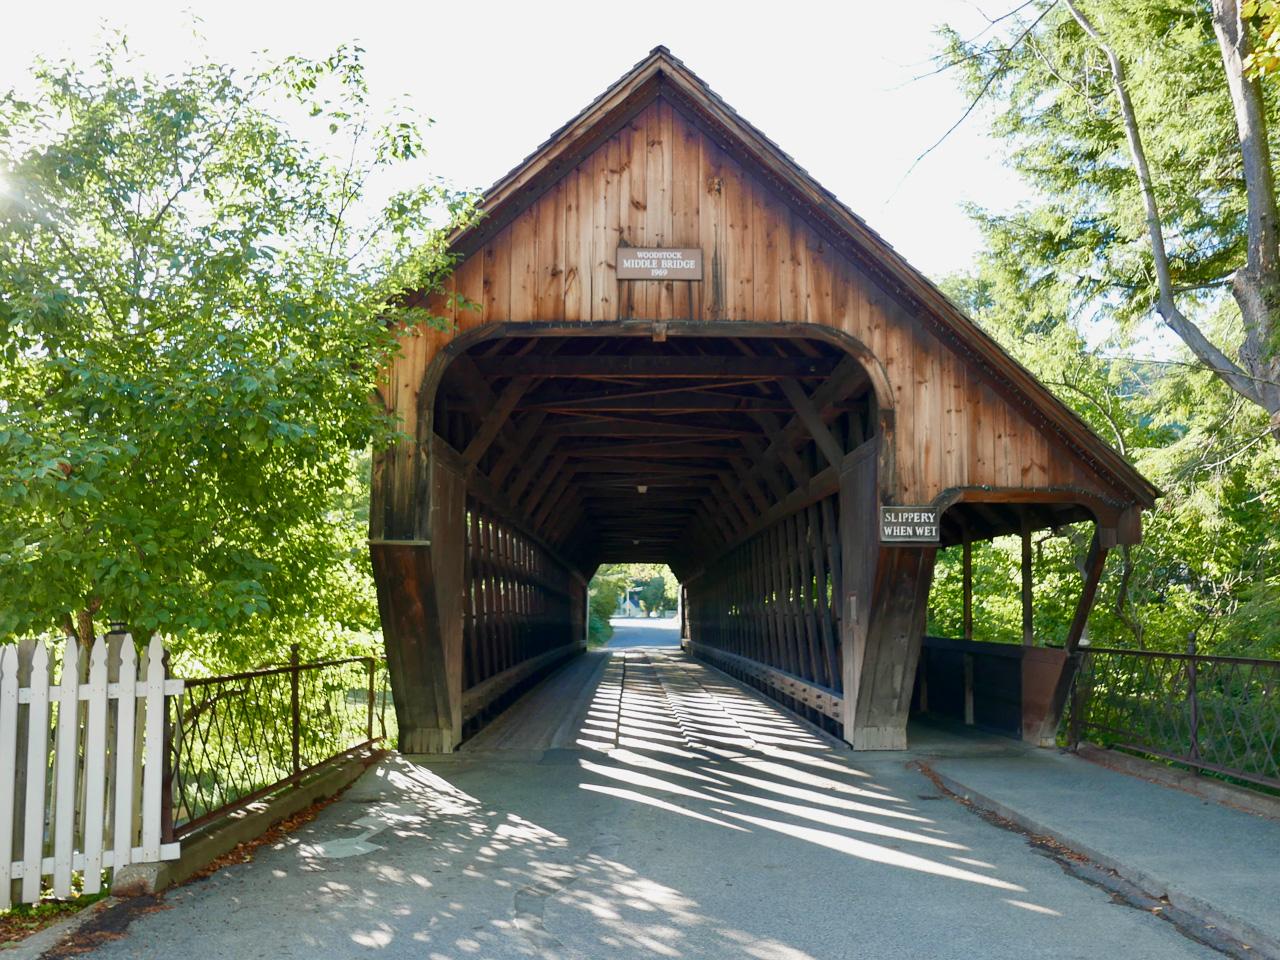 Cara Sharratt Travel - Middle Bridge - Woodstock, Vermont